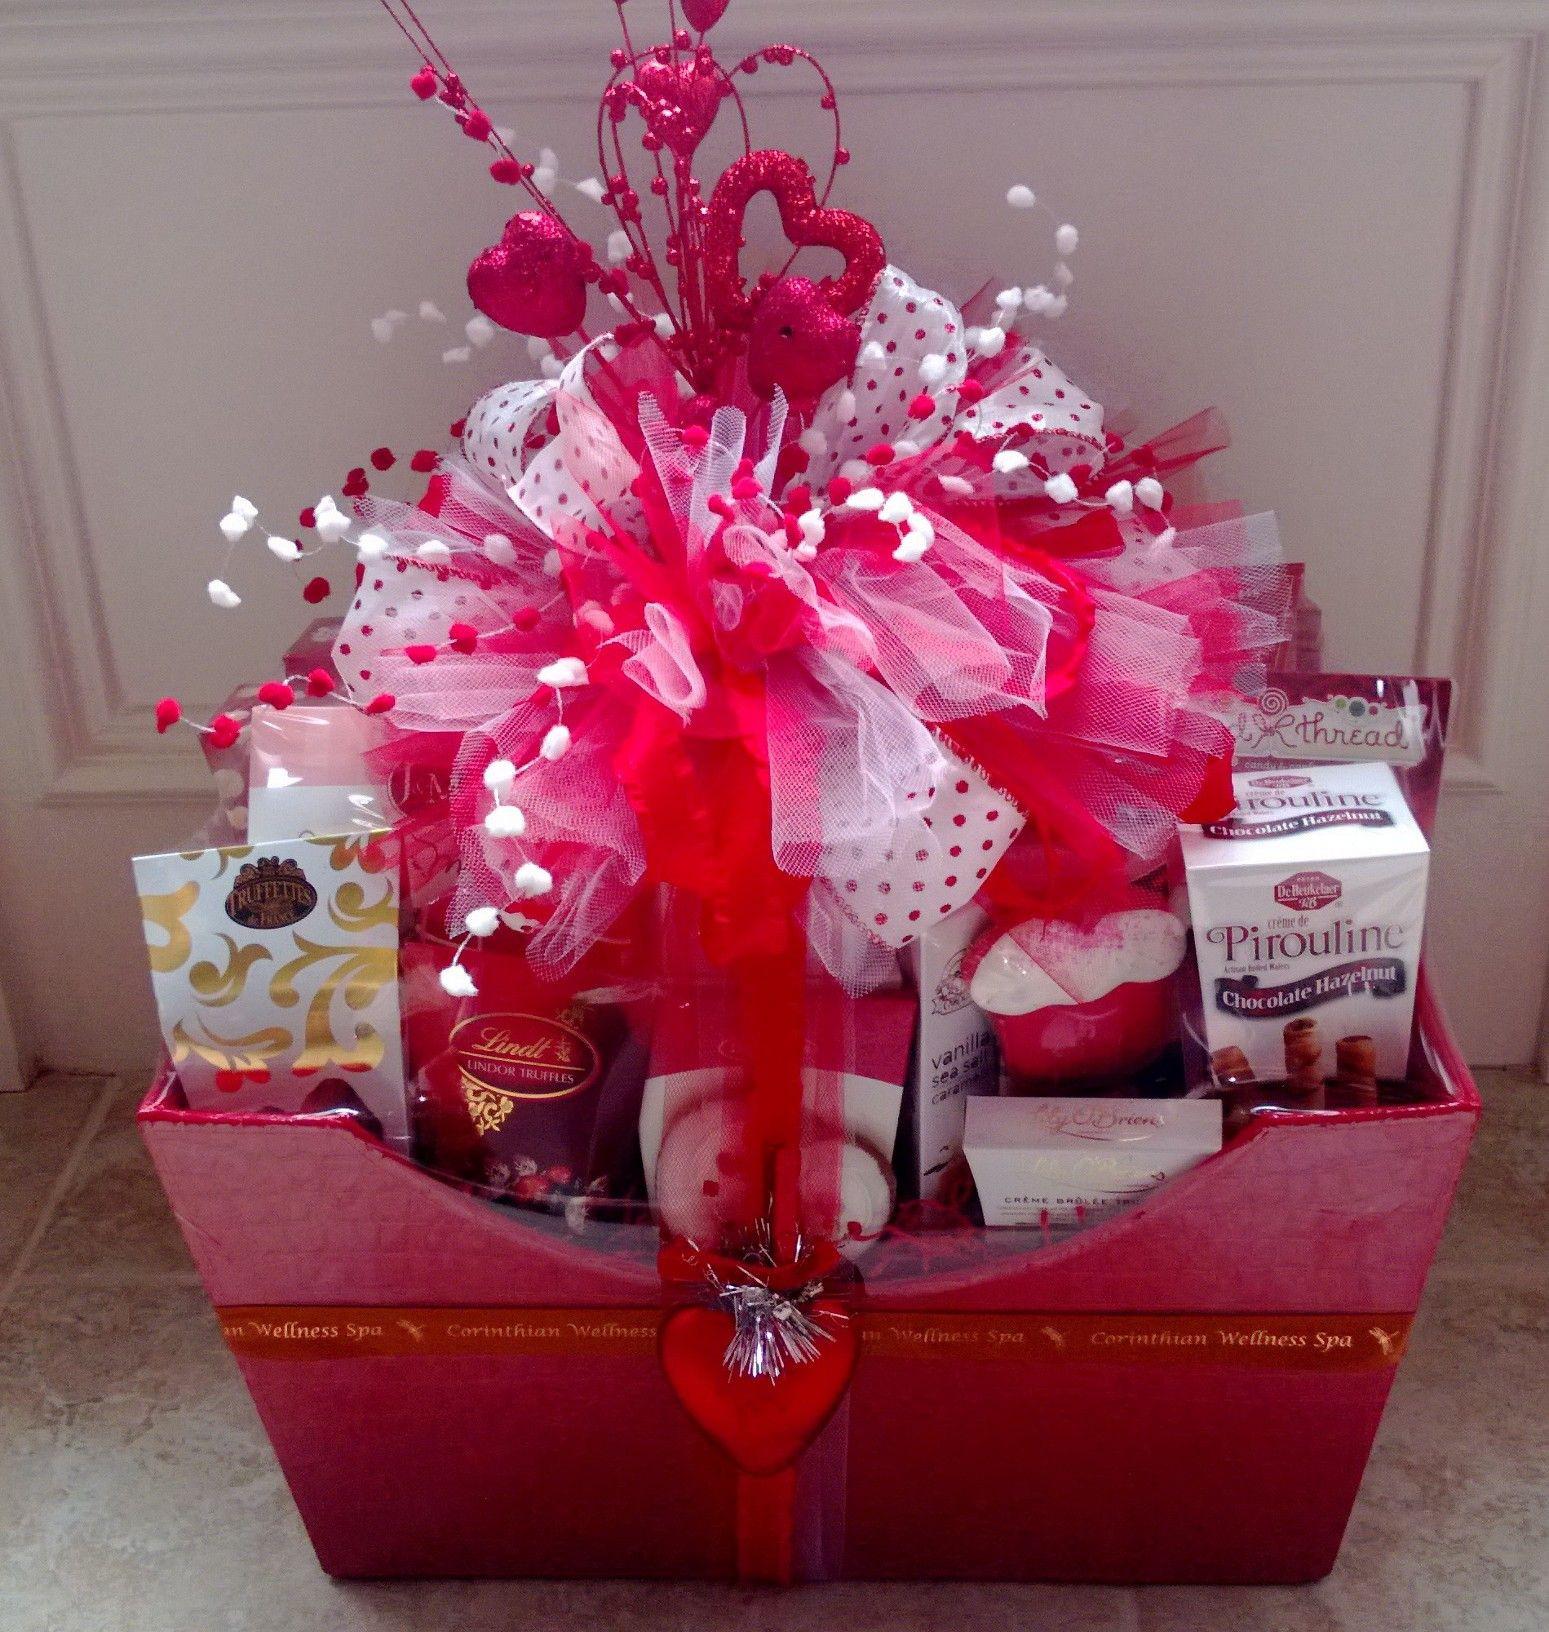 Valentines Day Gift Basket Ideas  Valentine s Basket Gift Wrapping Ideas